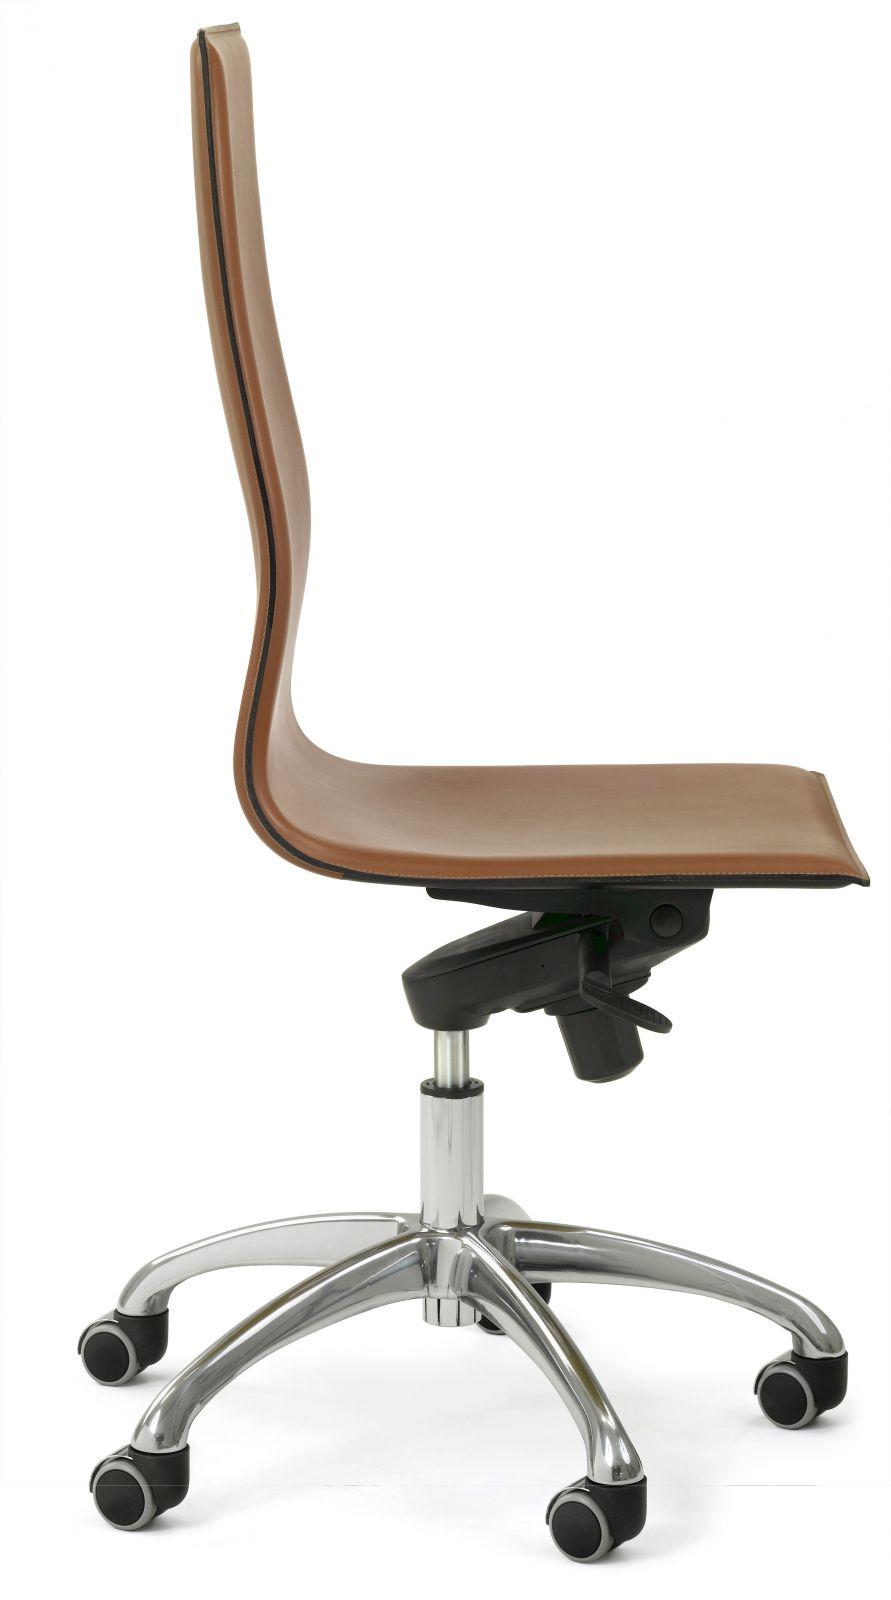 modern-office-chairs-Italian-furniture-designer-chairs (75).jpg